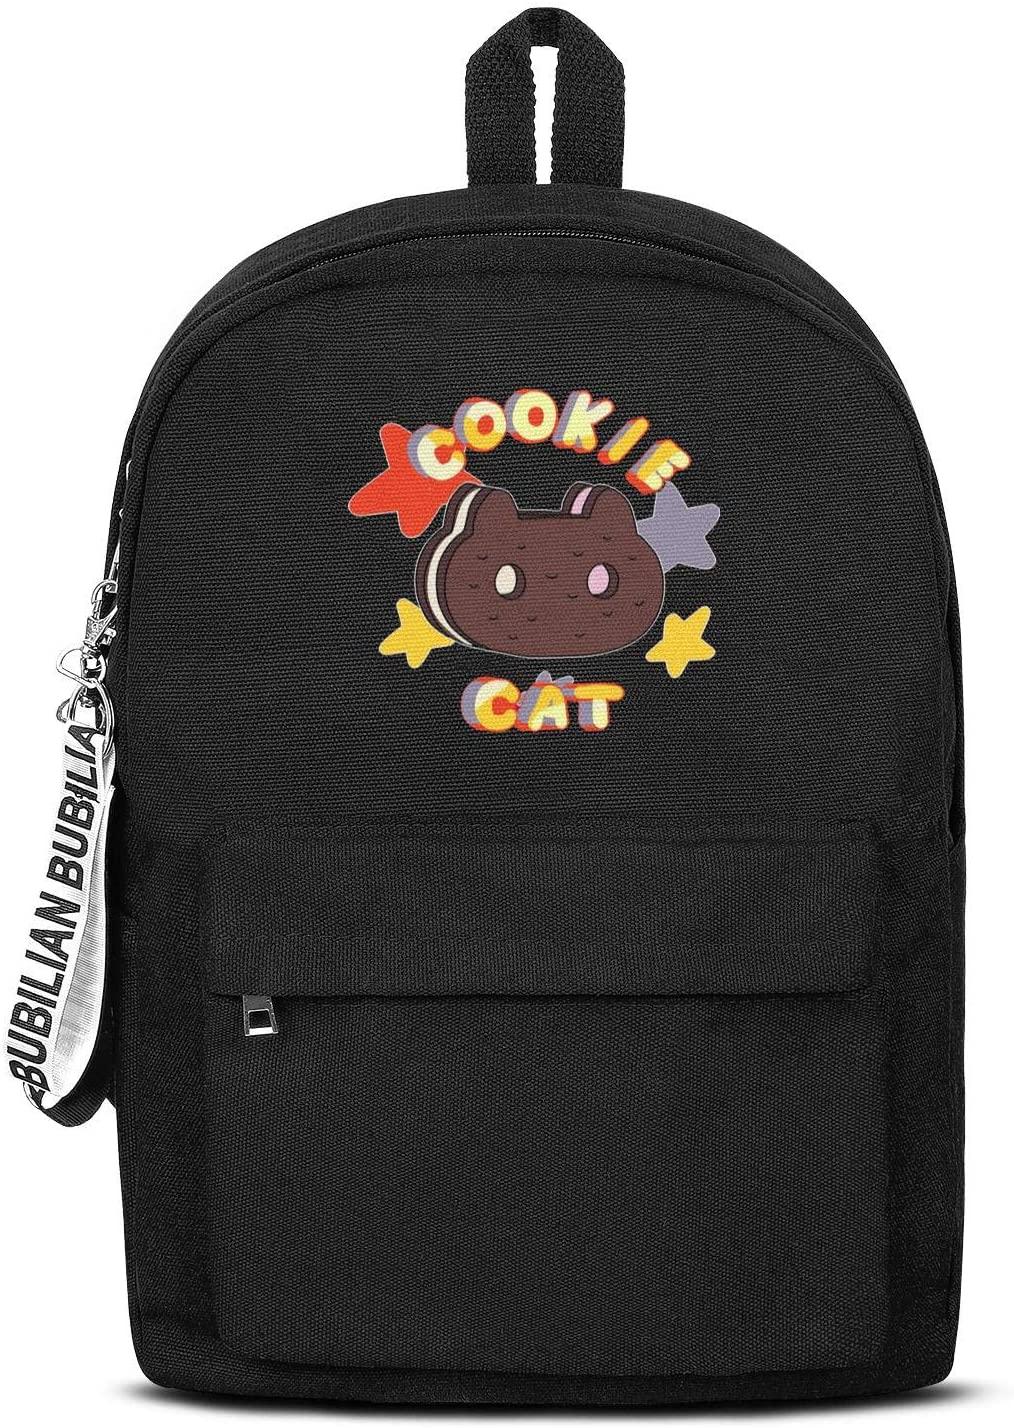 Mens Women's Steven-Universe-Cookie-Cat-star- Backpack Printed Outdoor Bags Black